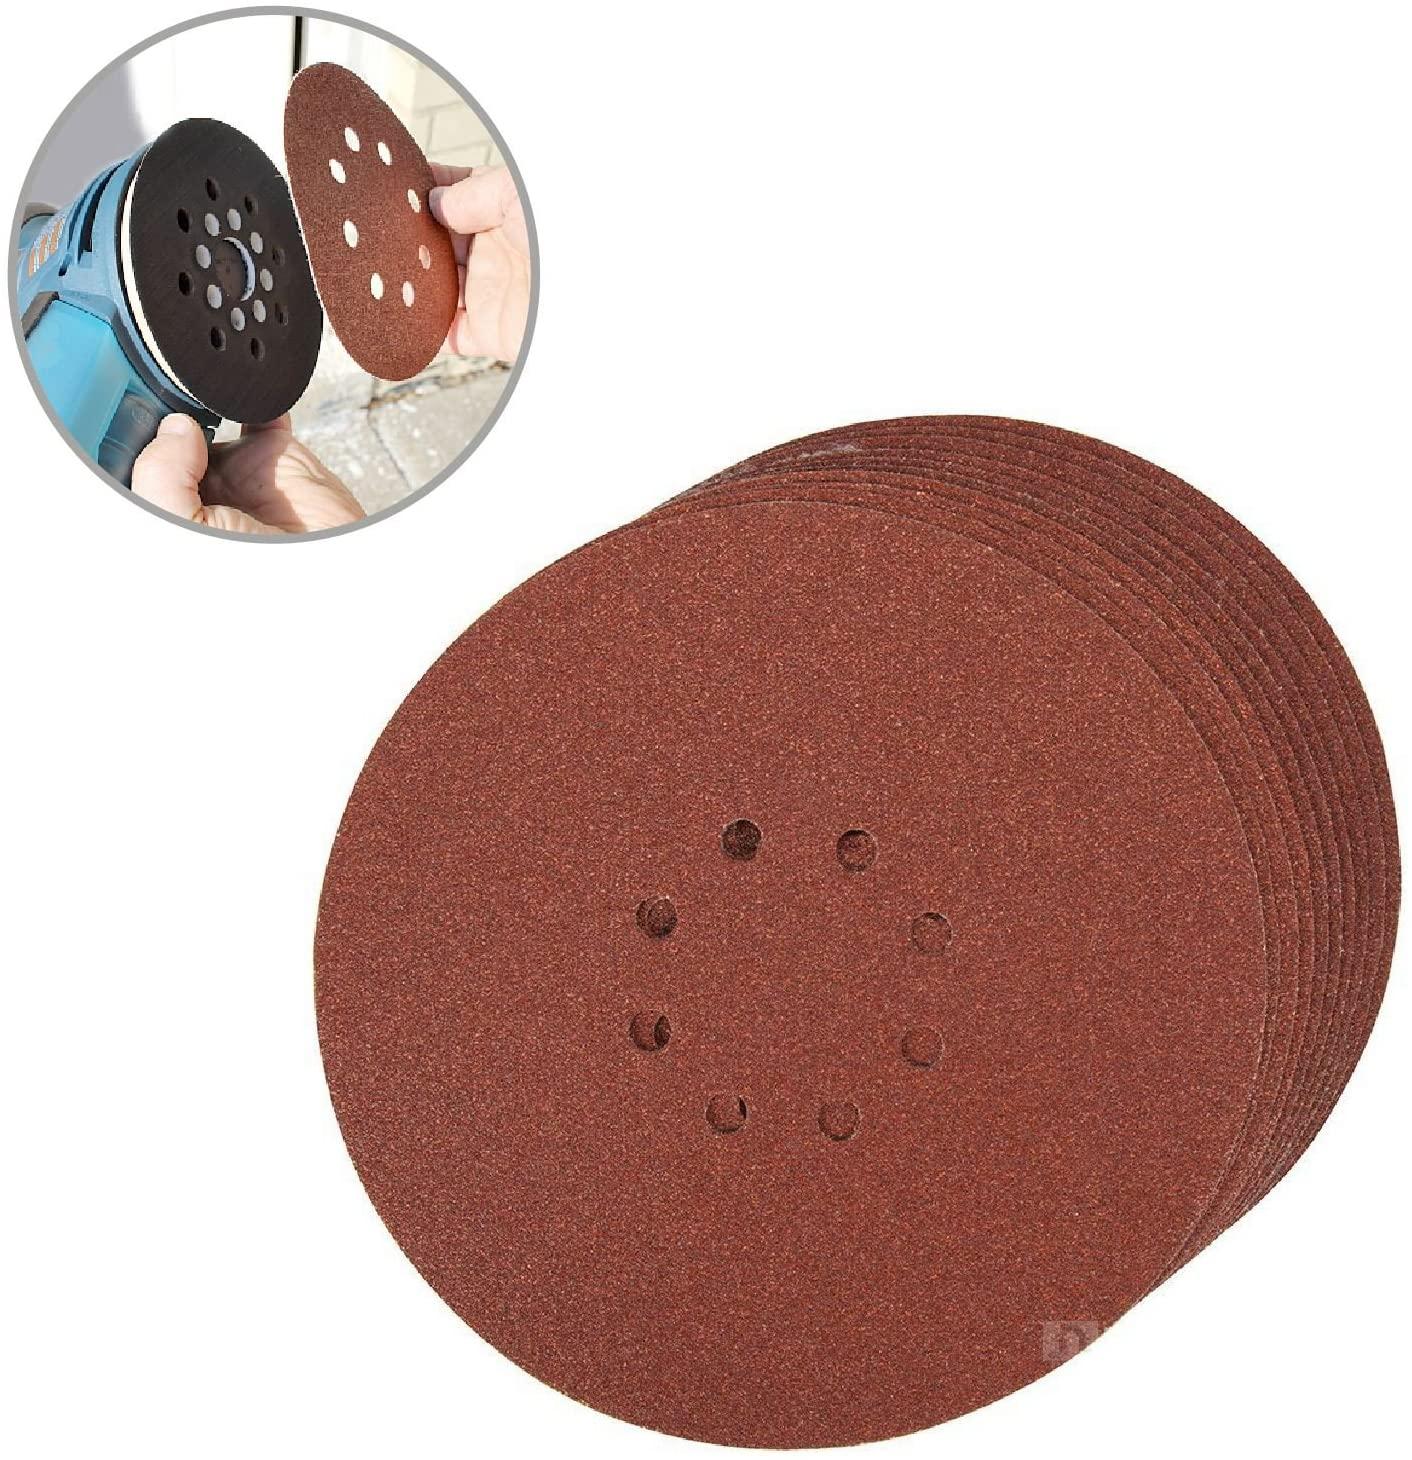 20 x Hook and Loop 225mm Sanding Disc Sheets 80 Grit Palm Sander Orbital Pads